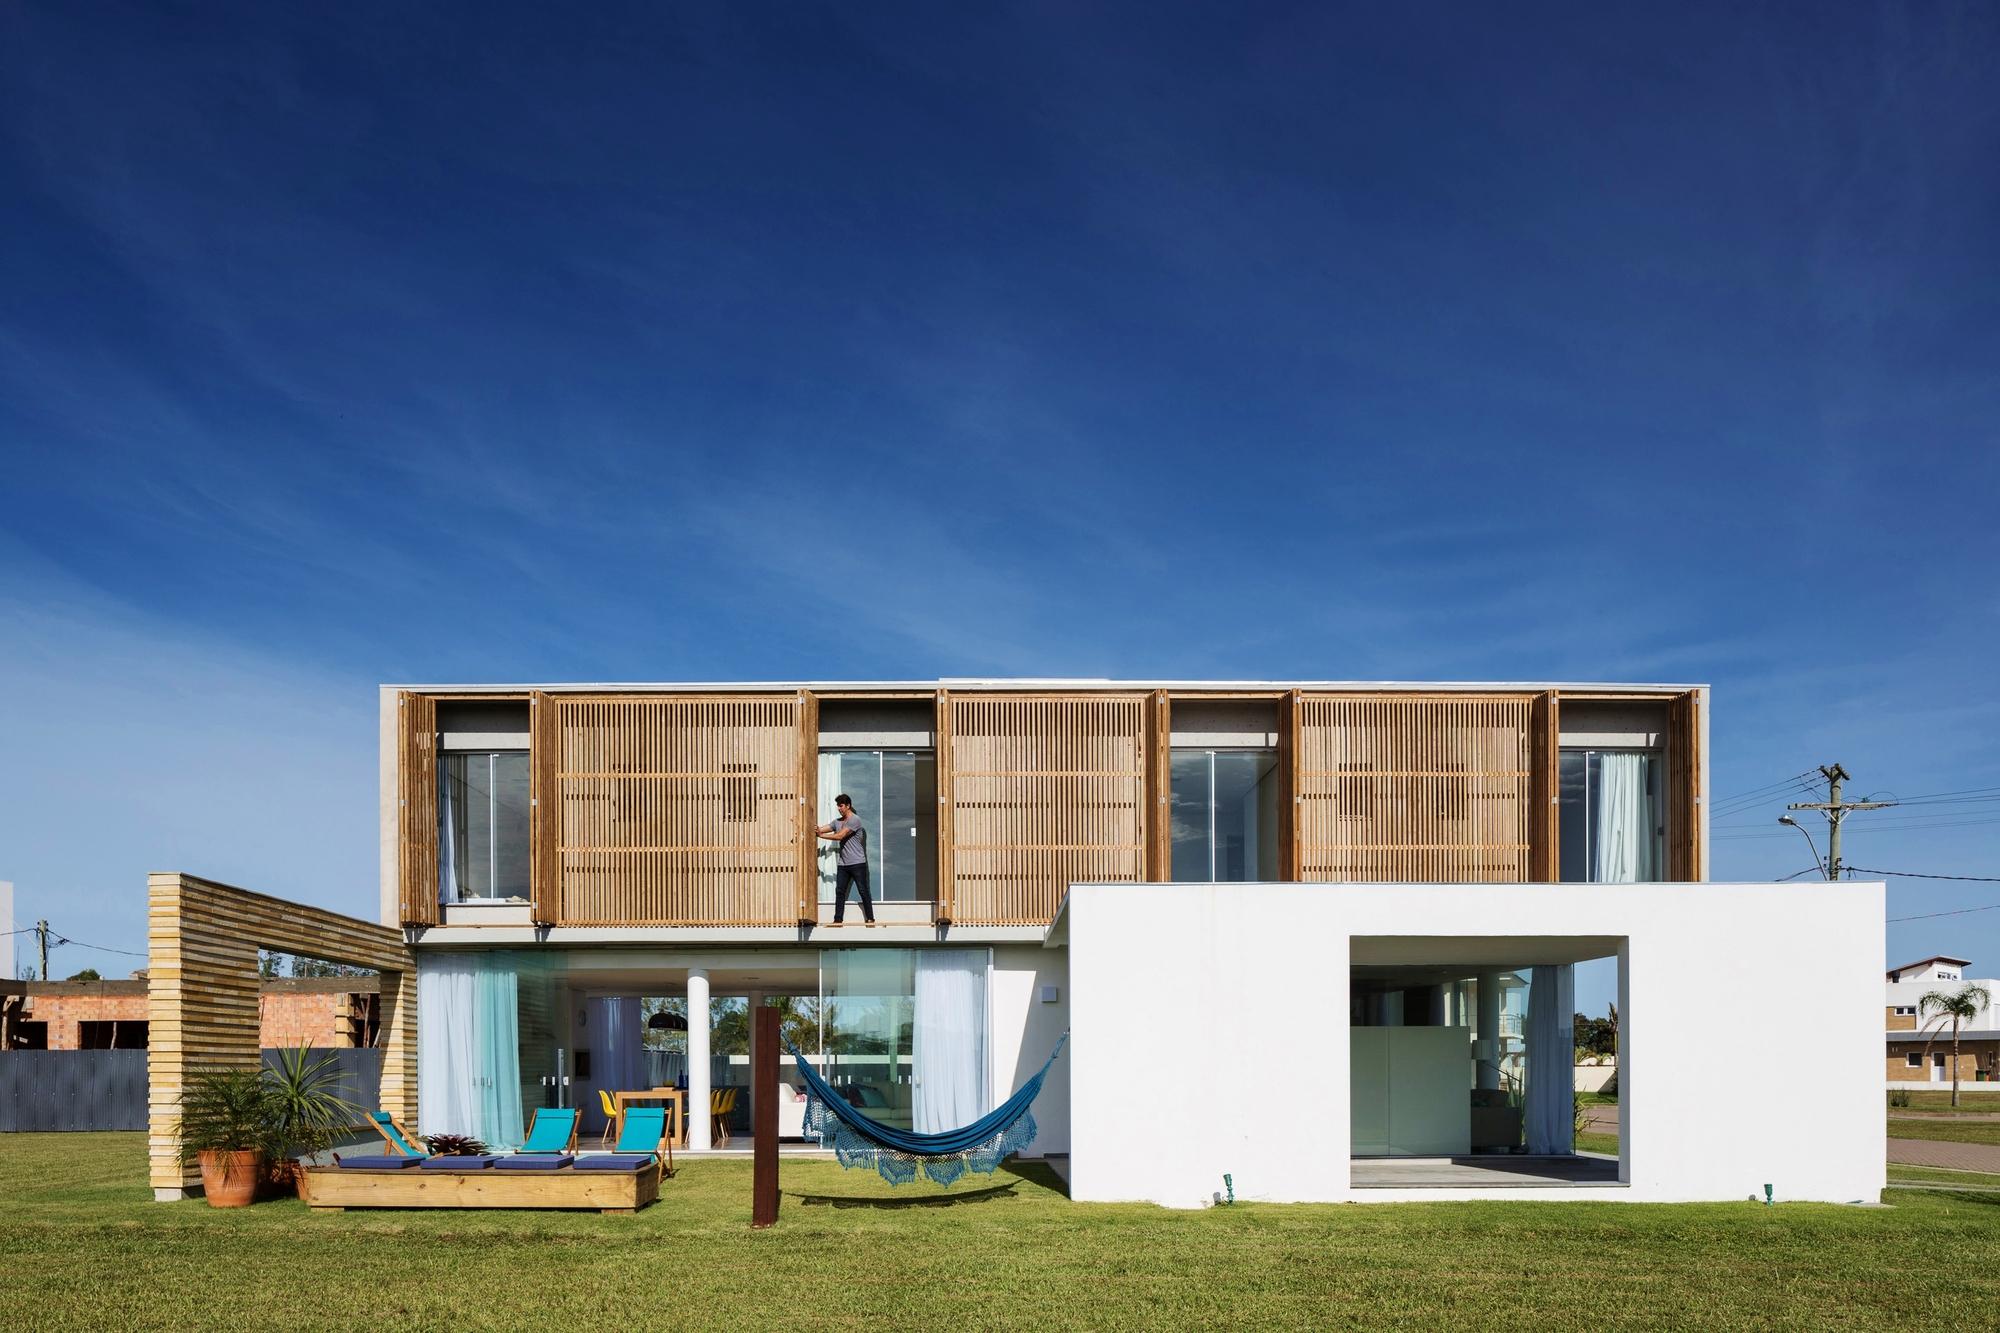 Casa22 hola arquitetura archdaily for Design house architecture hamilton